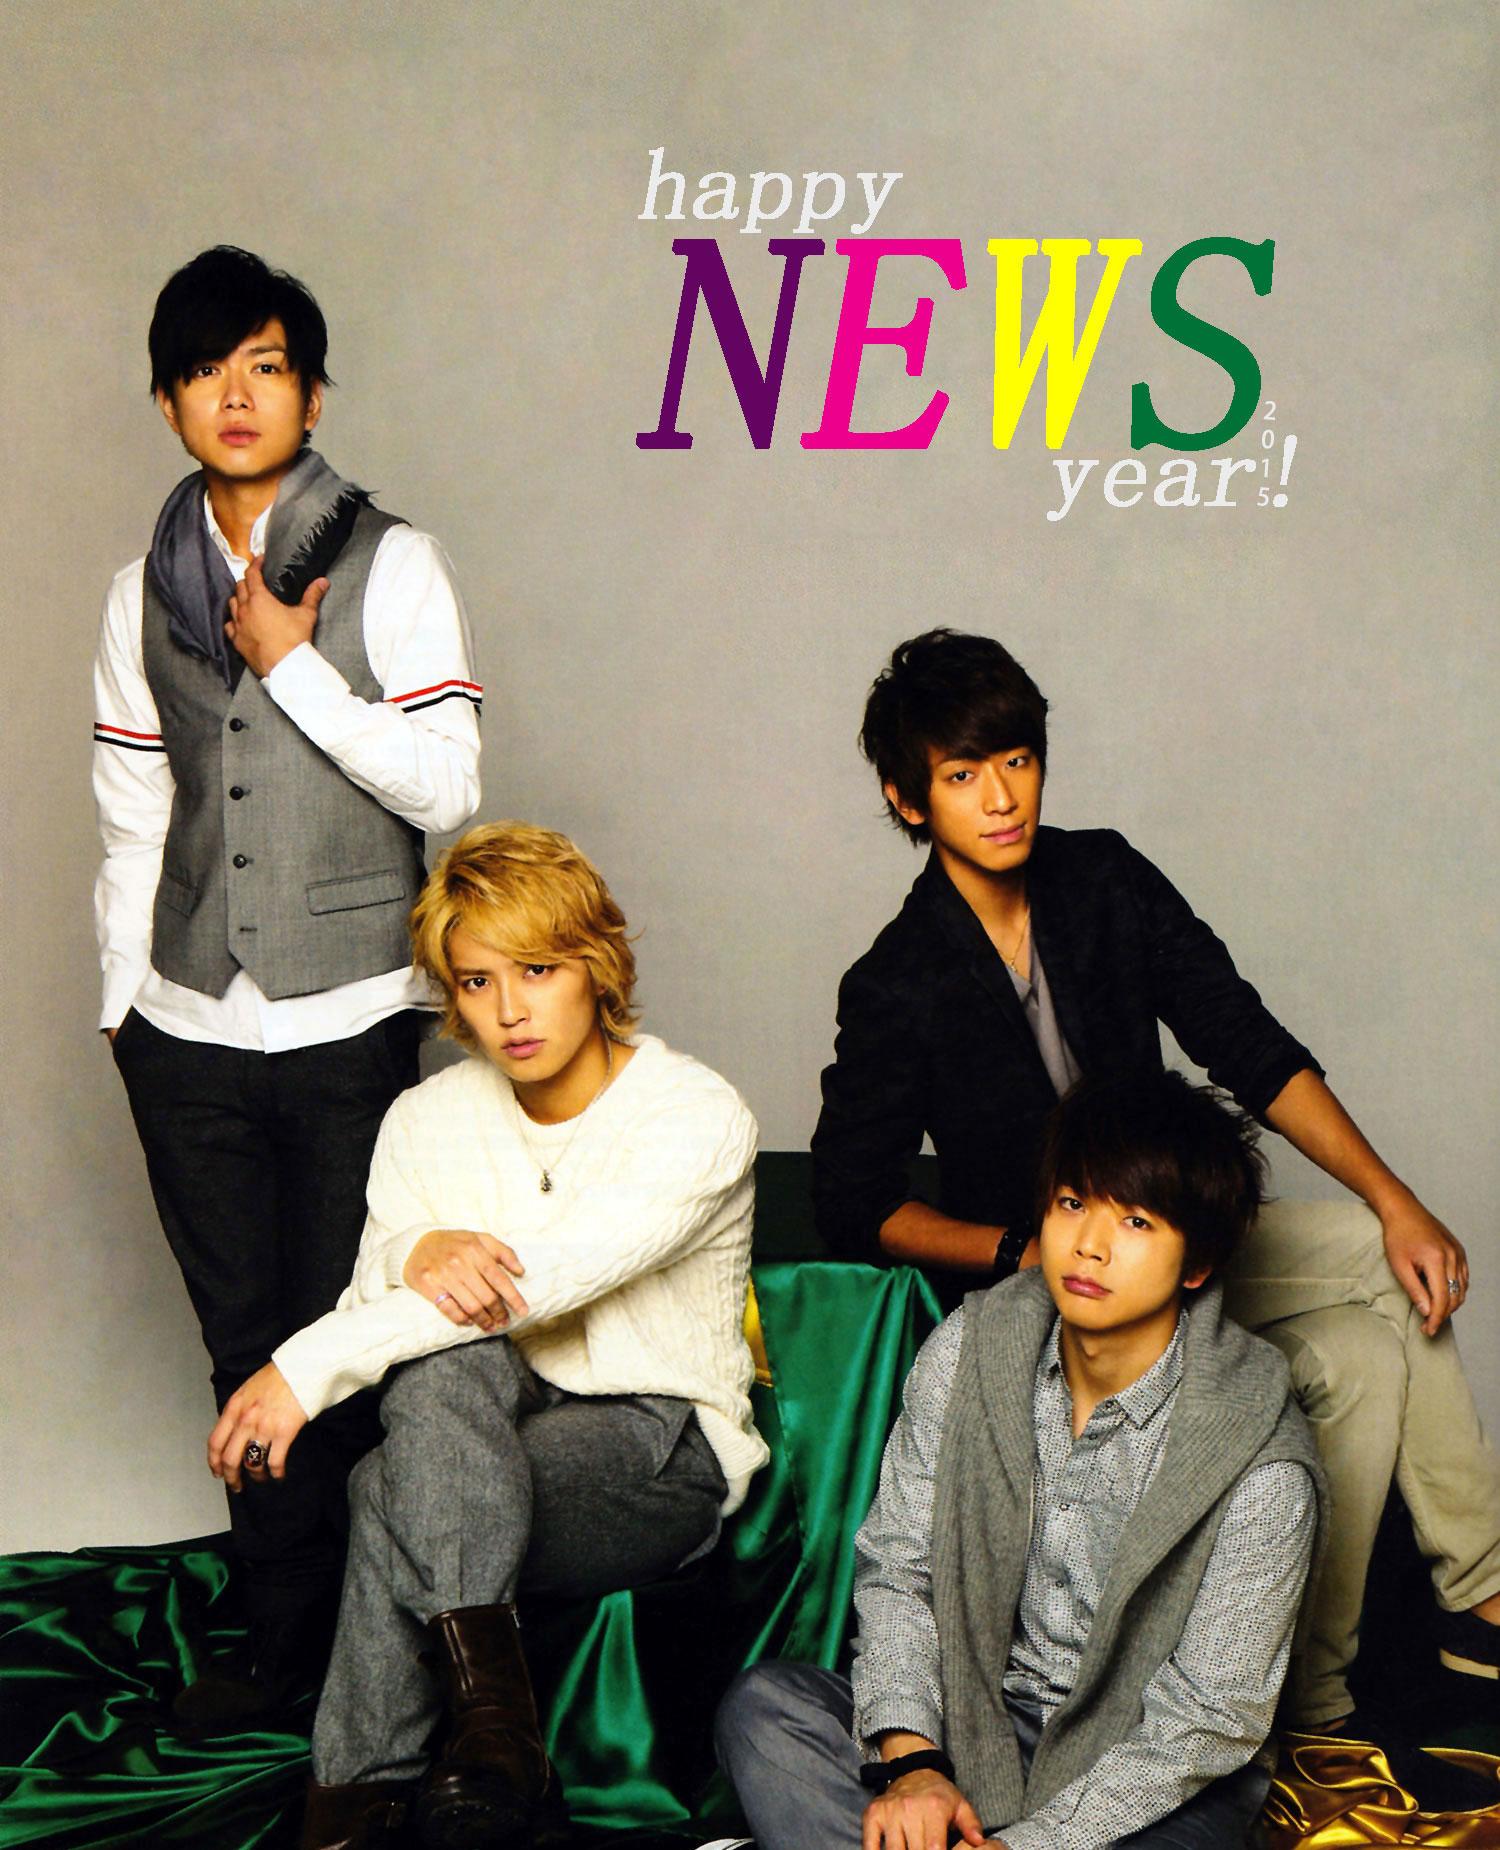 HAPPY-NEWS-YEAR-2015